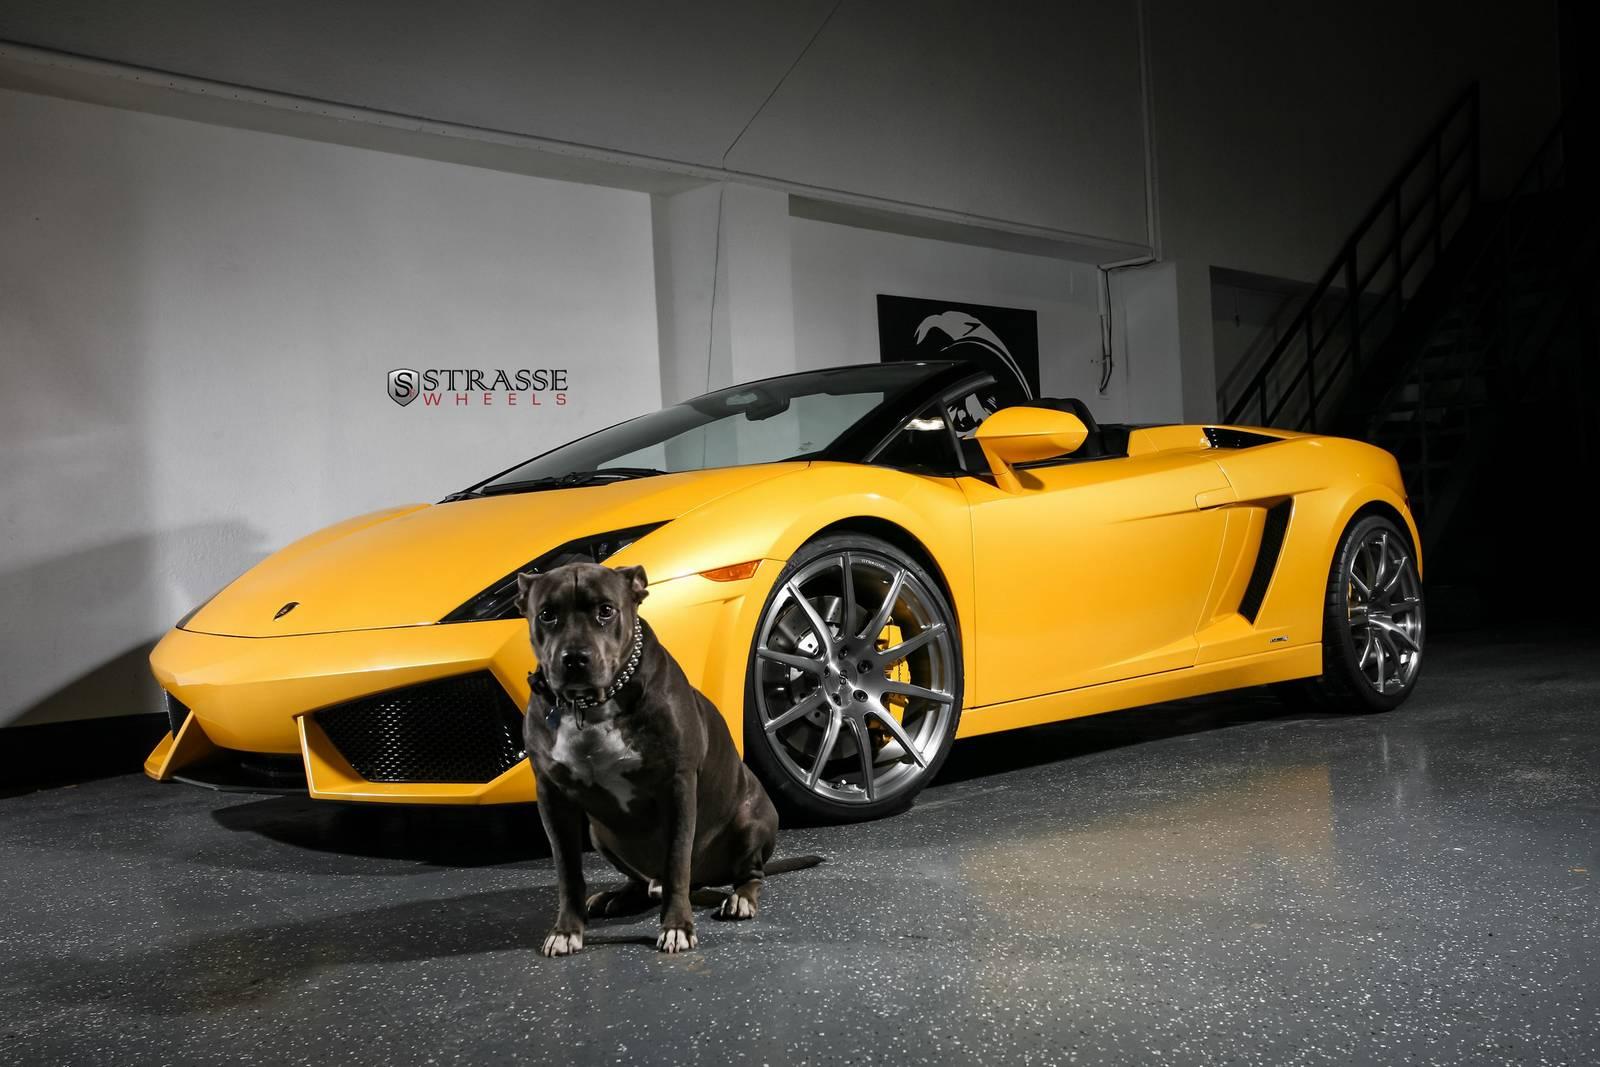 Giallo Midas Lamborghini Gallardo Spyder With Strasse Wheels Gtspirit